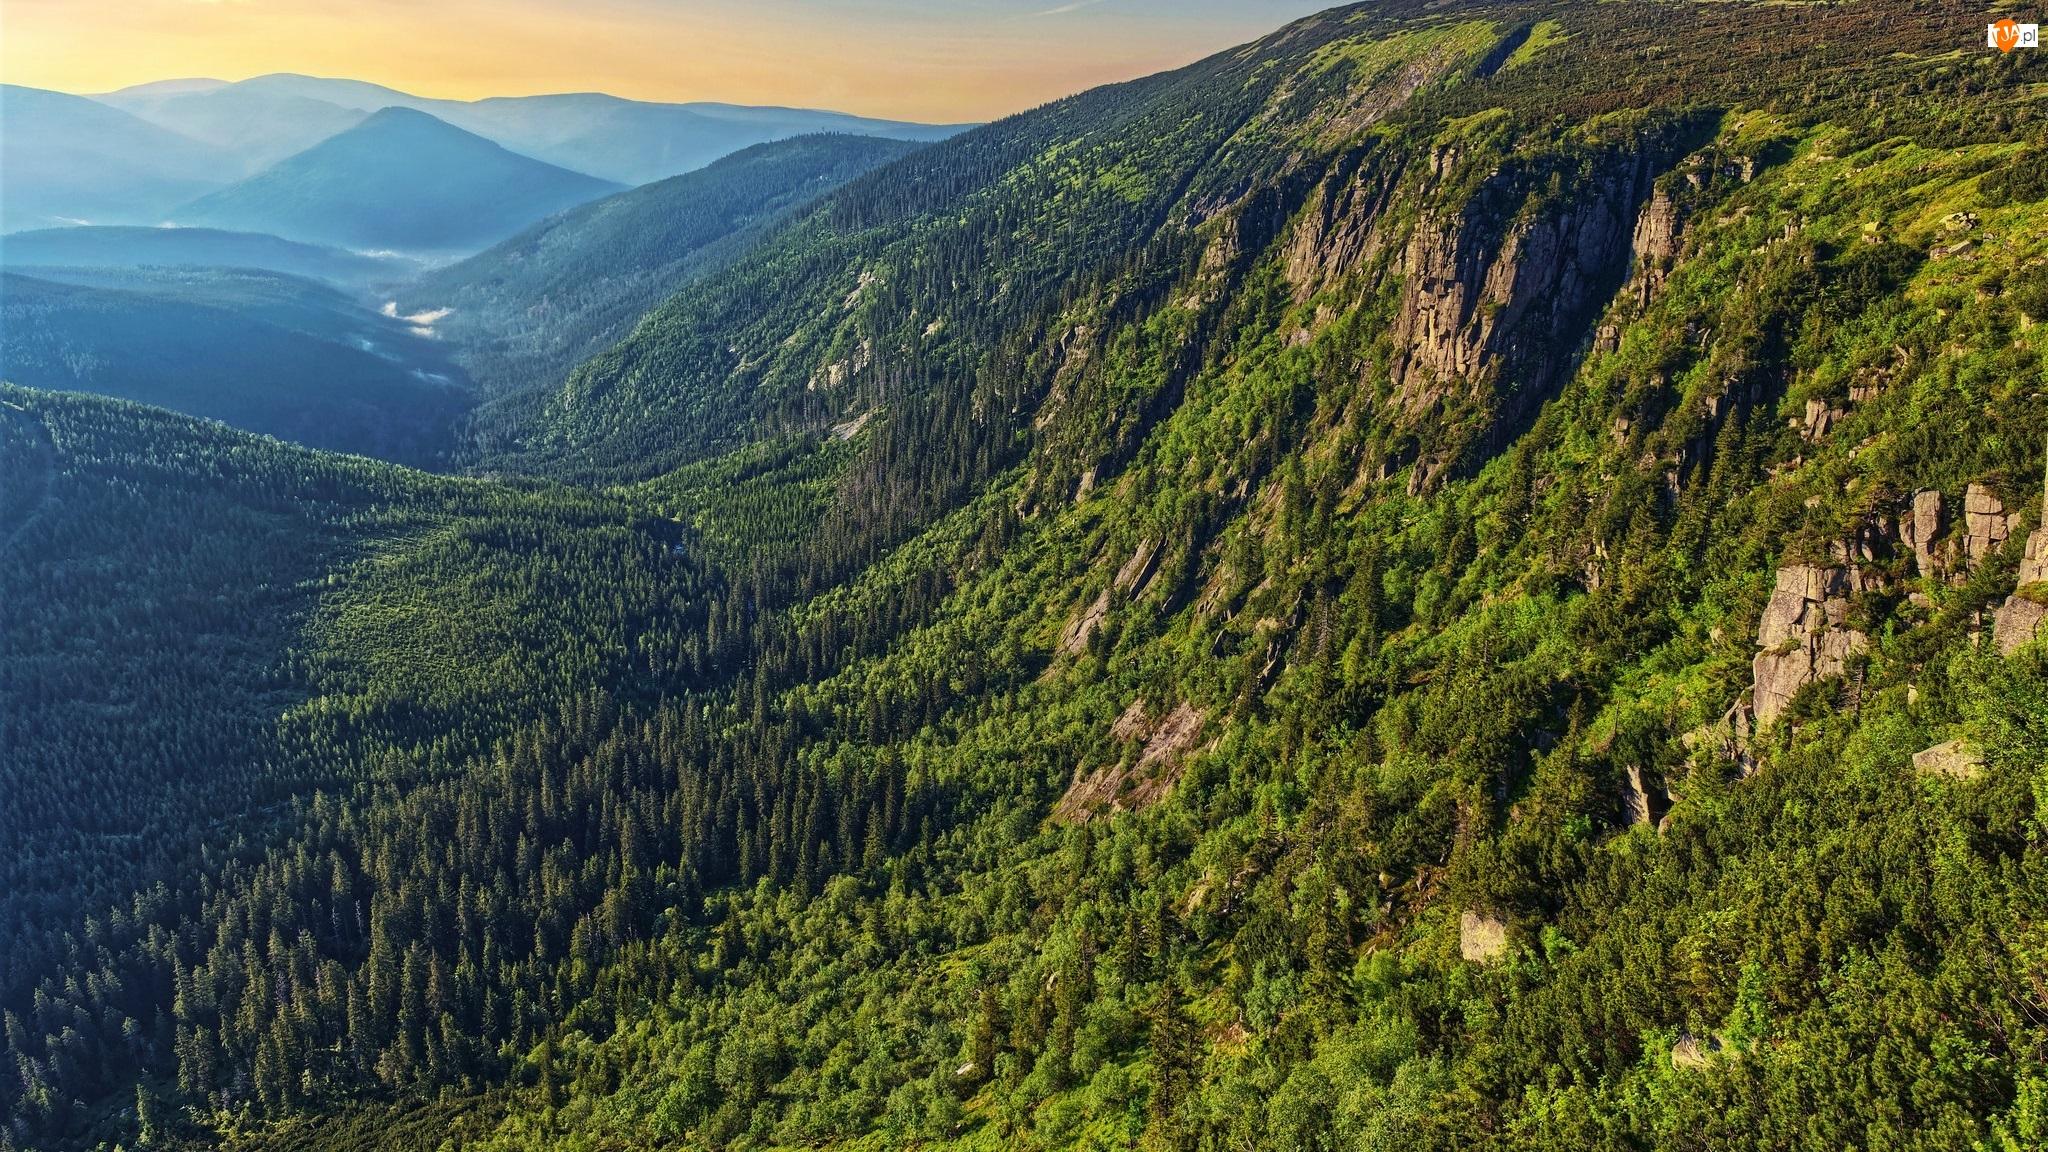 Góry, Zalesione, Lasy, Polska, Karkonosze, Dolina